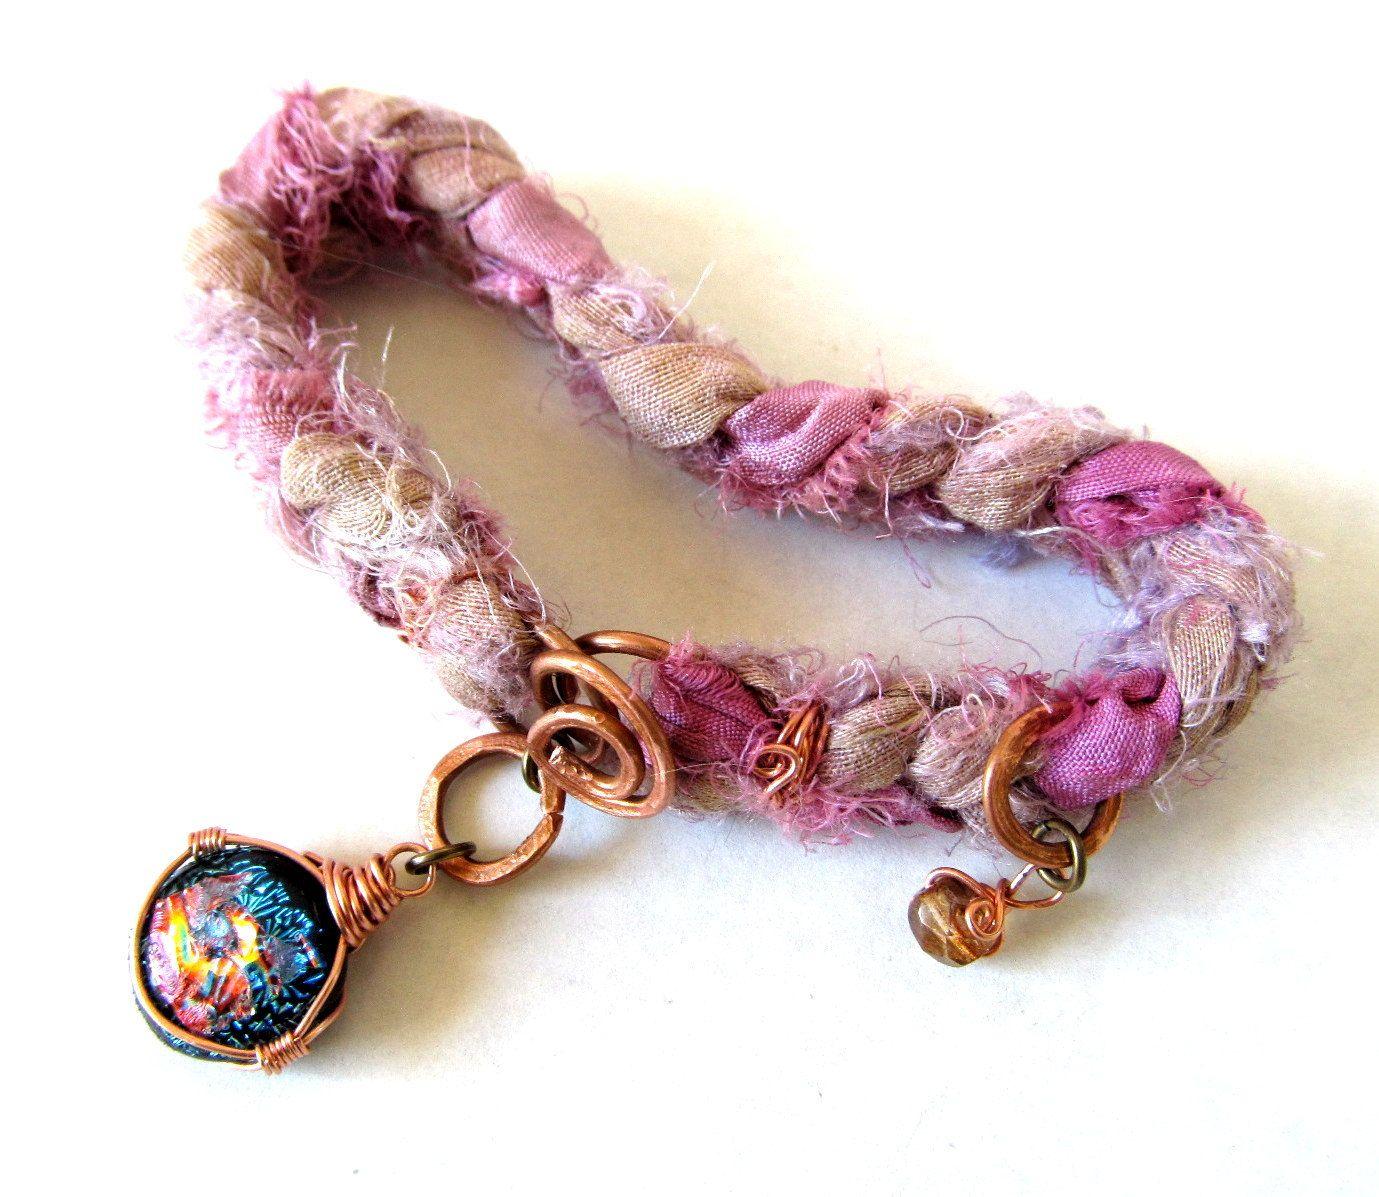 Raw Edge Sari Silk Ribbon Friendship Bracelet - Copper Wire Wrapped Fused Dichroic Glass Jewelry - Very Boho - Made in US Eco Friendly. $36.00, via Etsy.